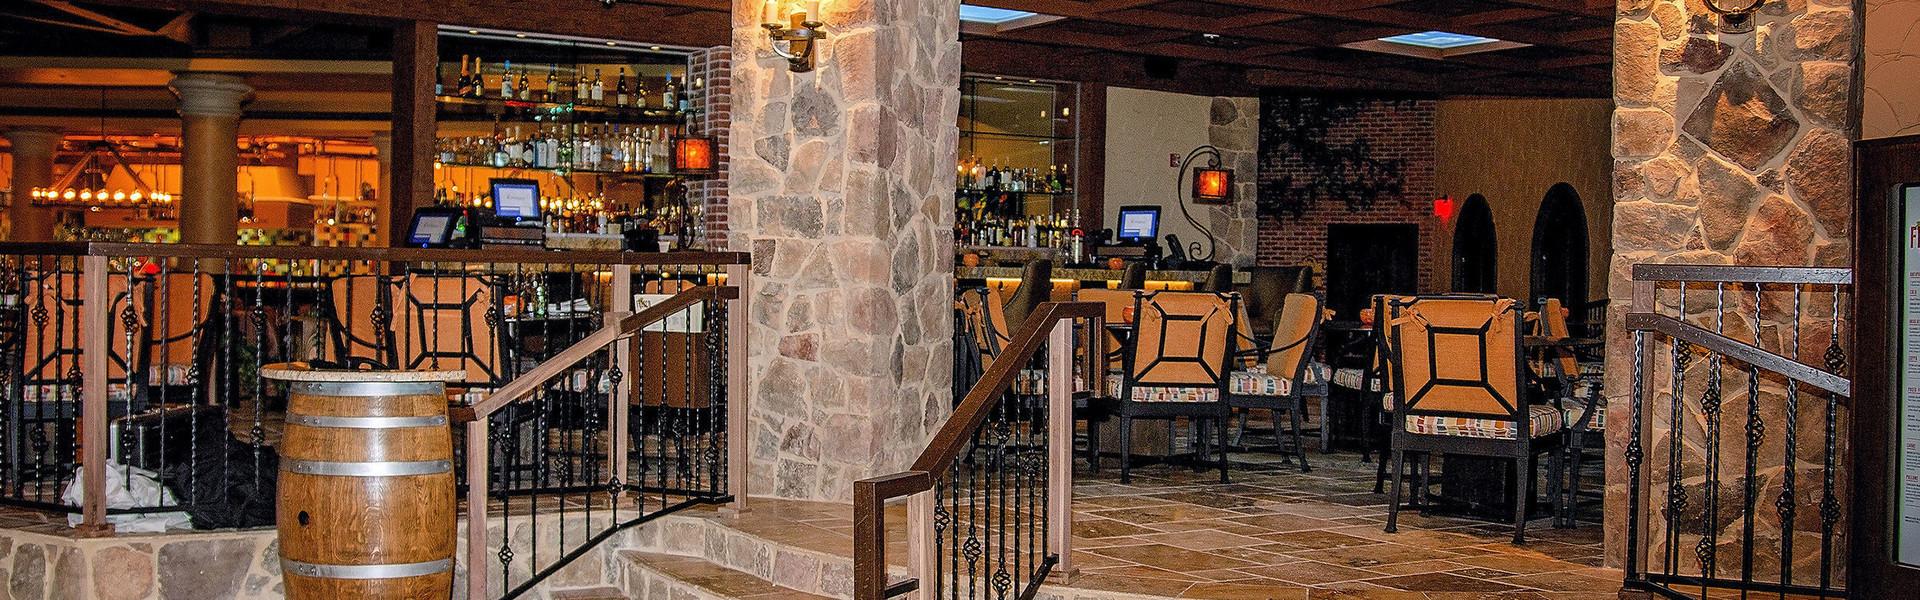 Outside the best Italian restaurant Las Vegas has to offer | Menu For Fresco Italiano | Westgate Las Vegas Resort & Casino